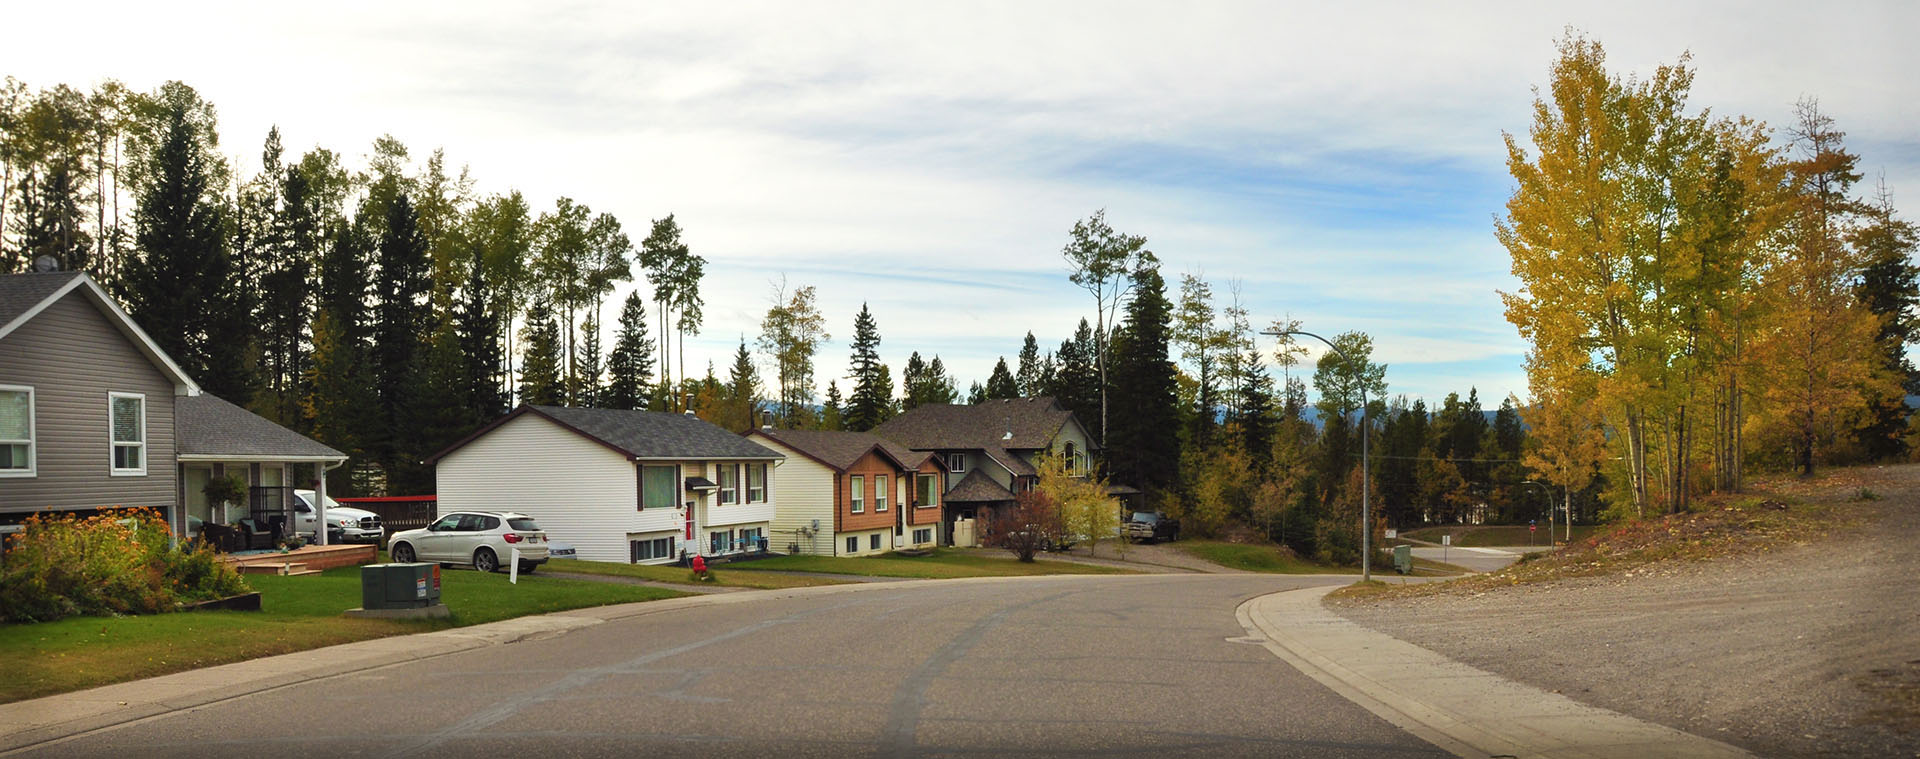 tumbler ridge homes